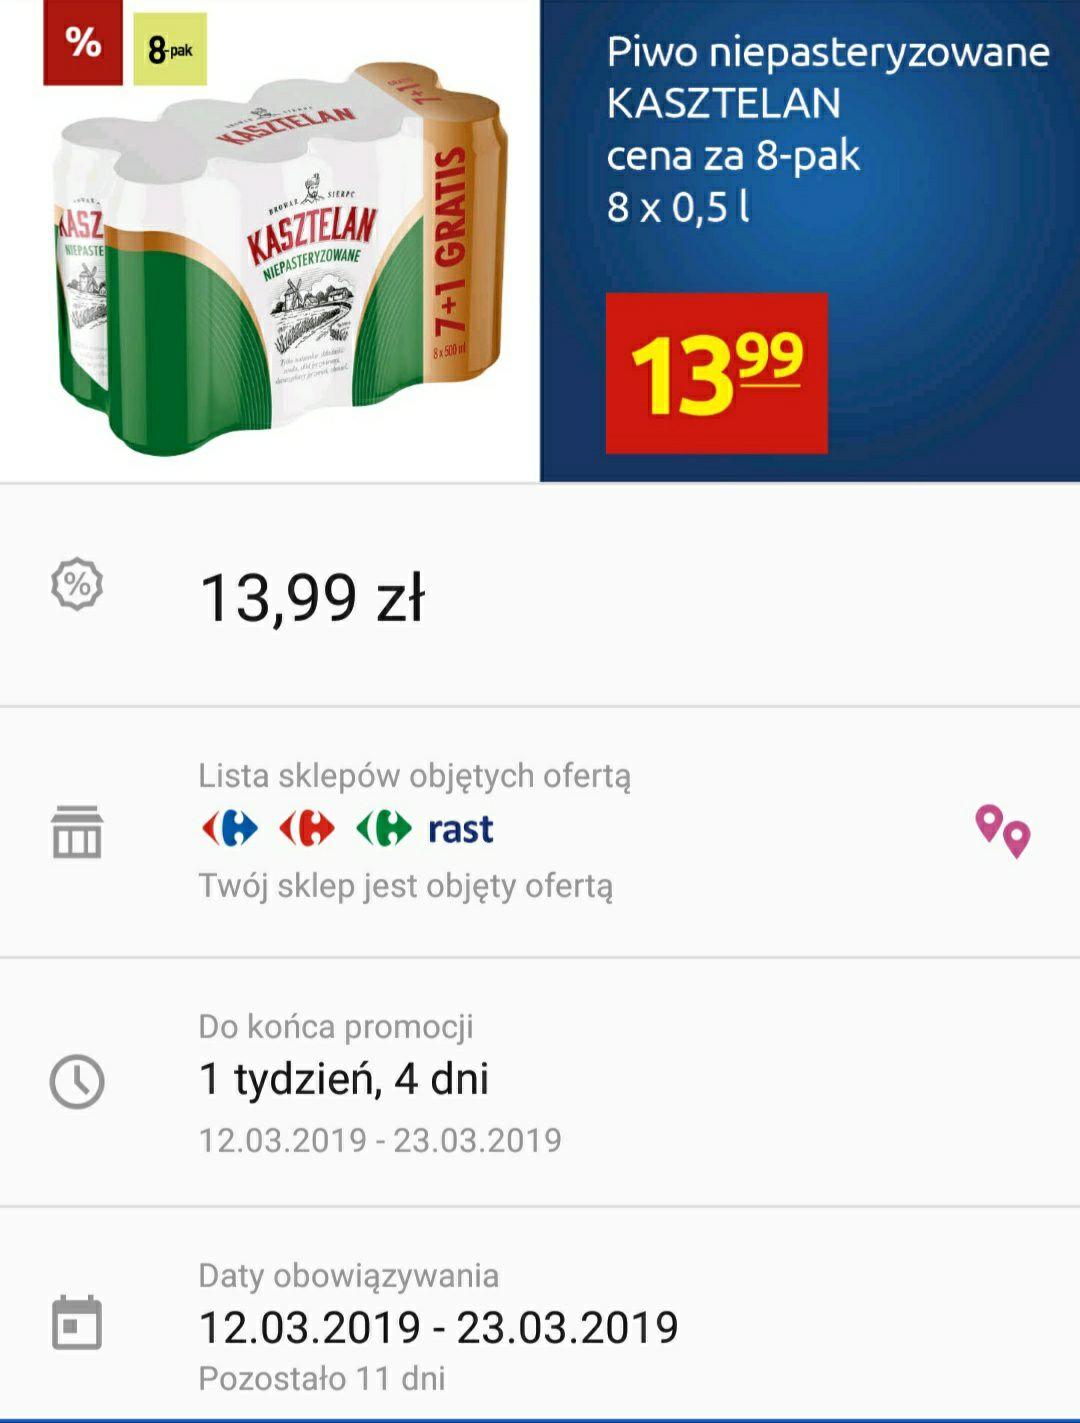 Kasztelan 8 pack Carrefour Polska